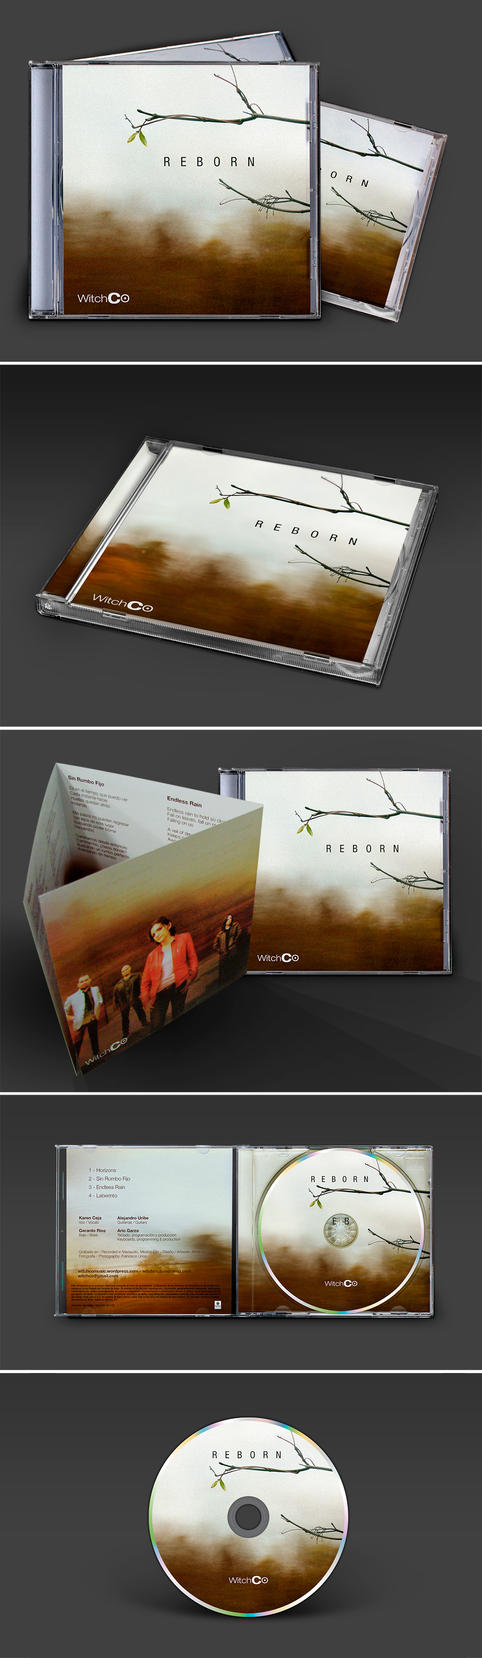 Reborn - CD Artwork by mariux